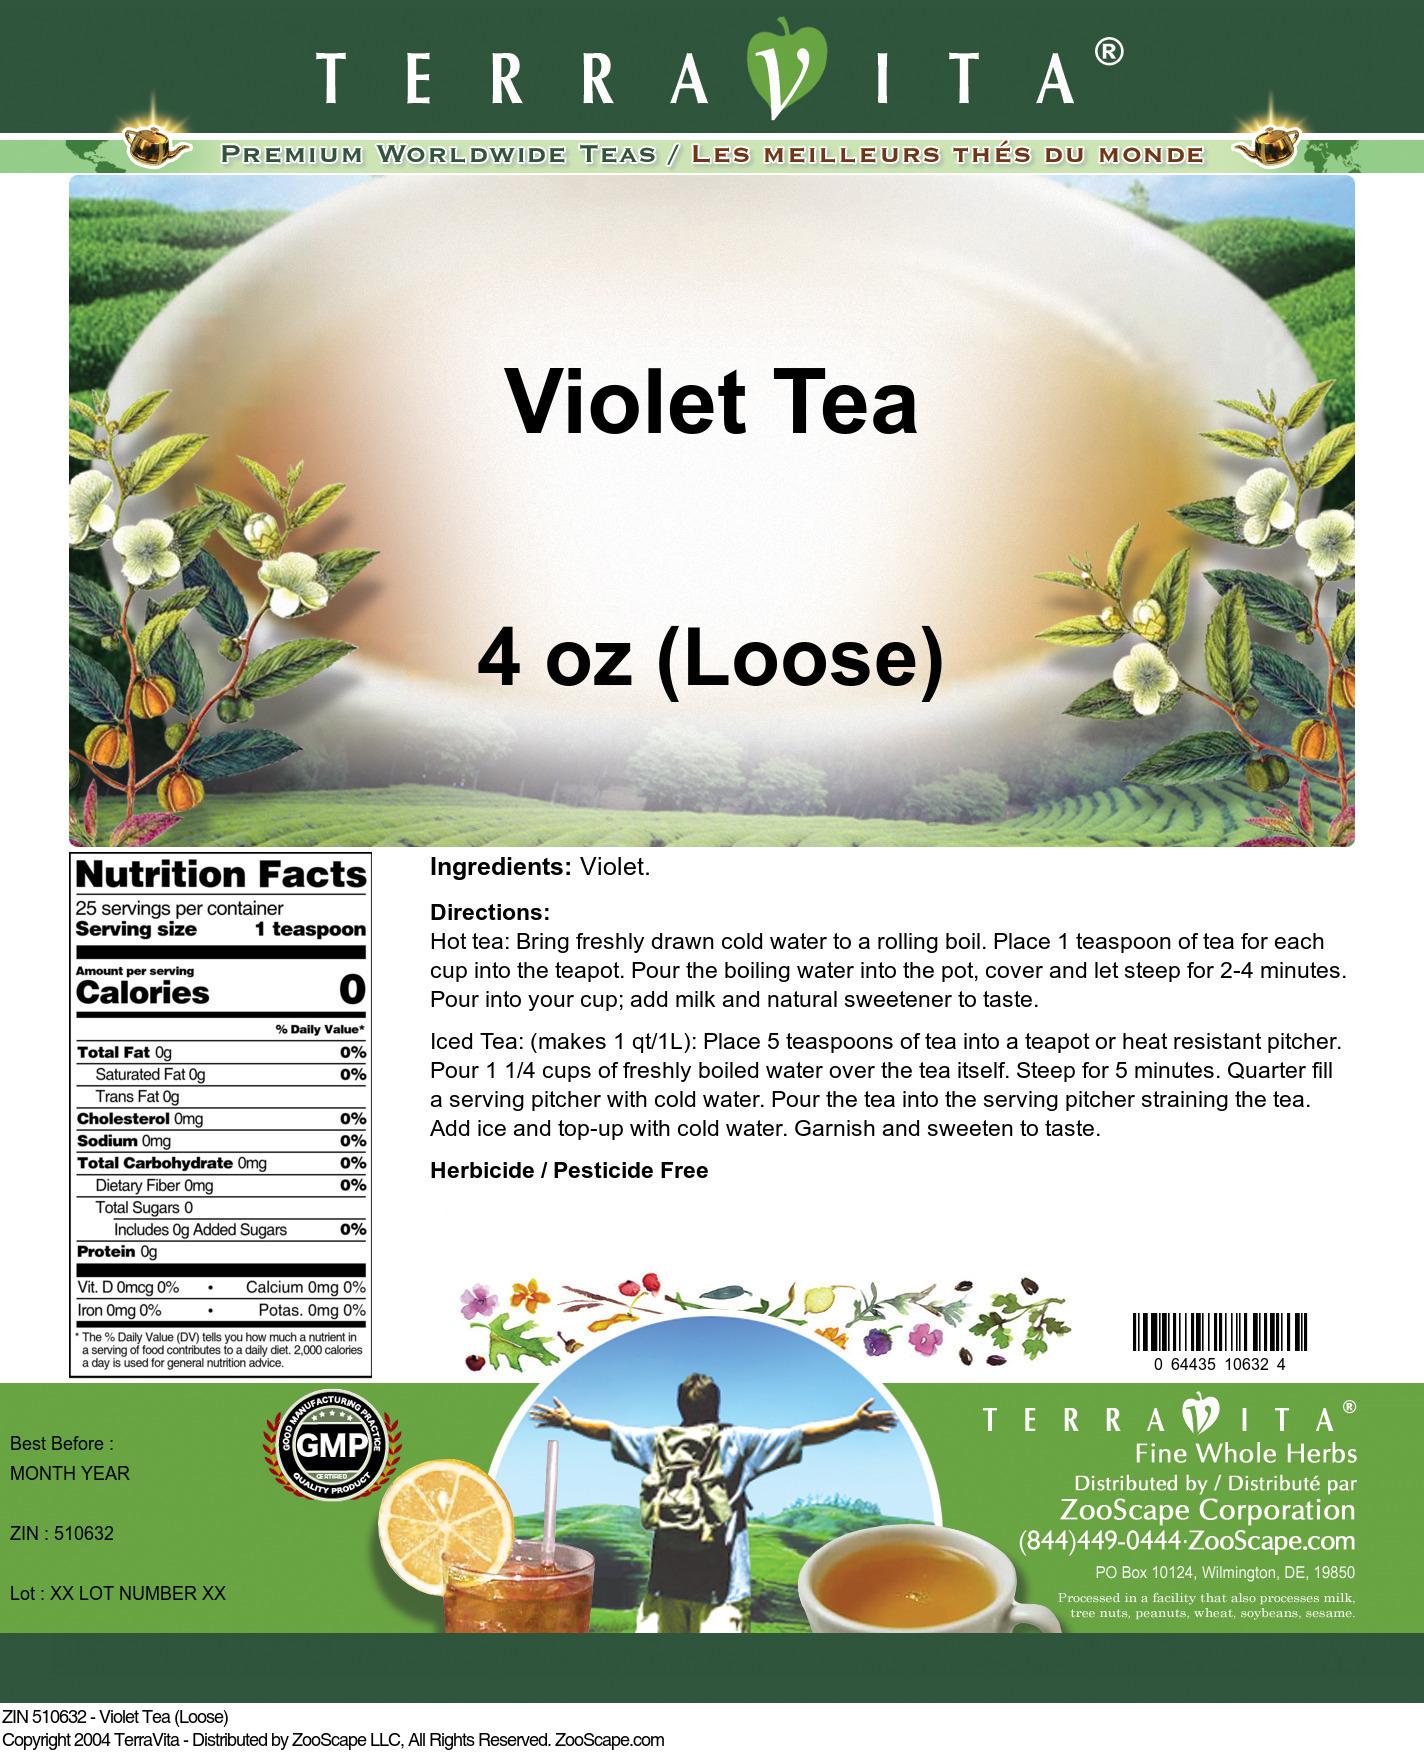 Violet Tea (Loose)